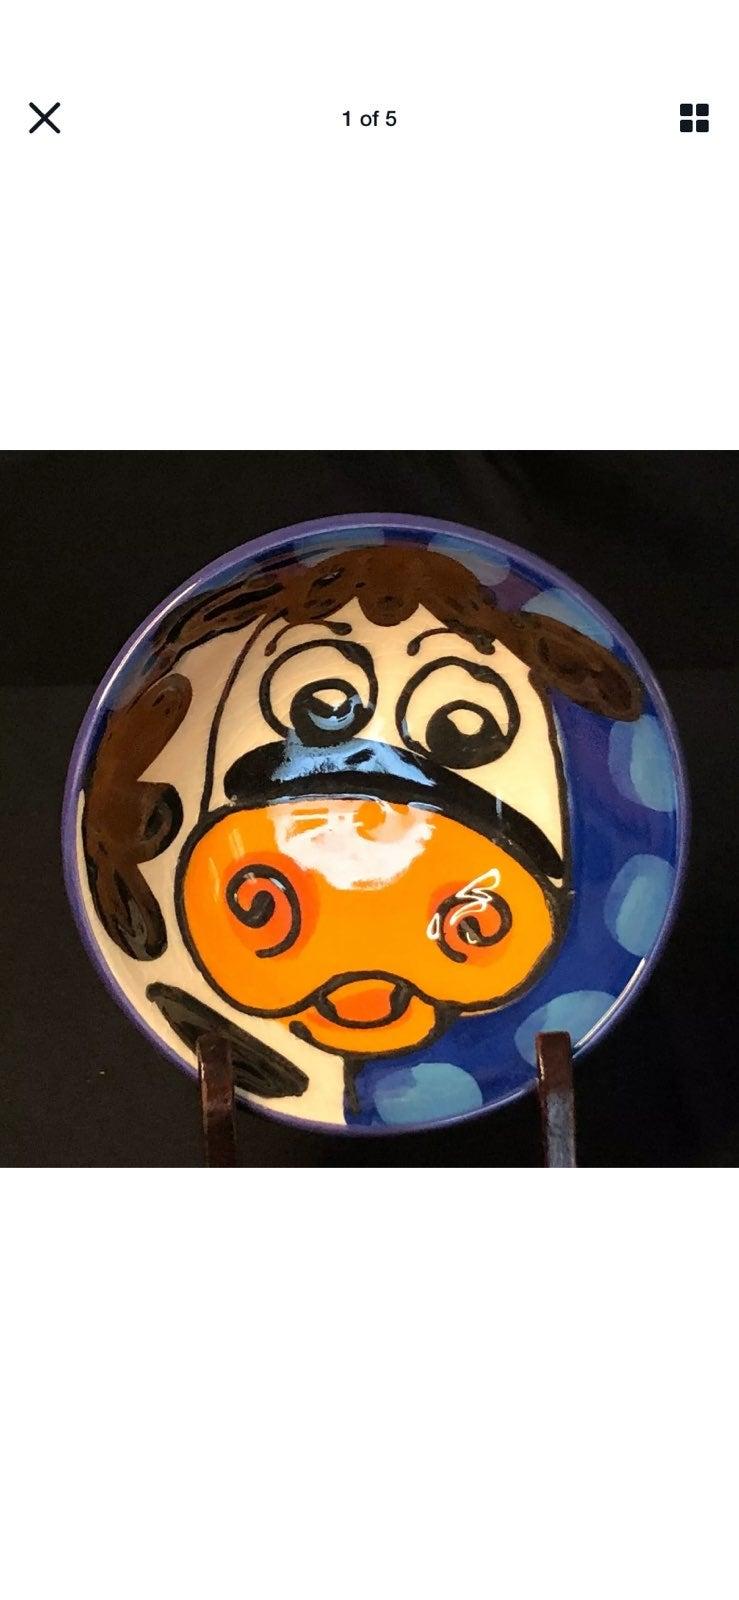 Splashy™ New Zealand Cow Ceramic dish ha